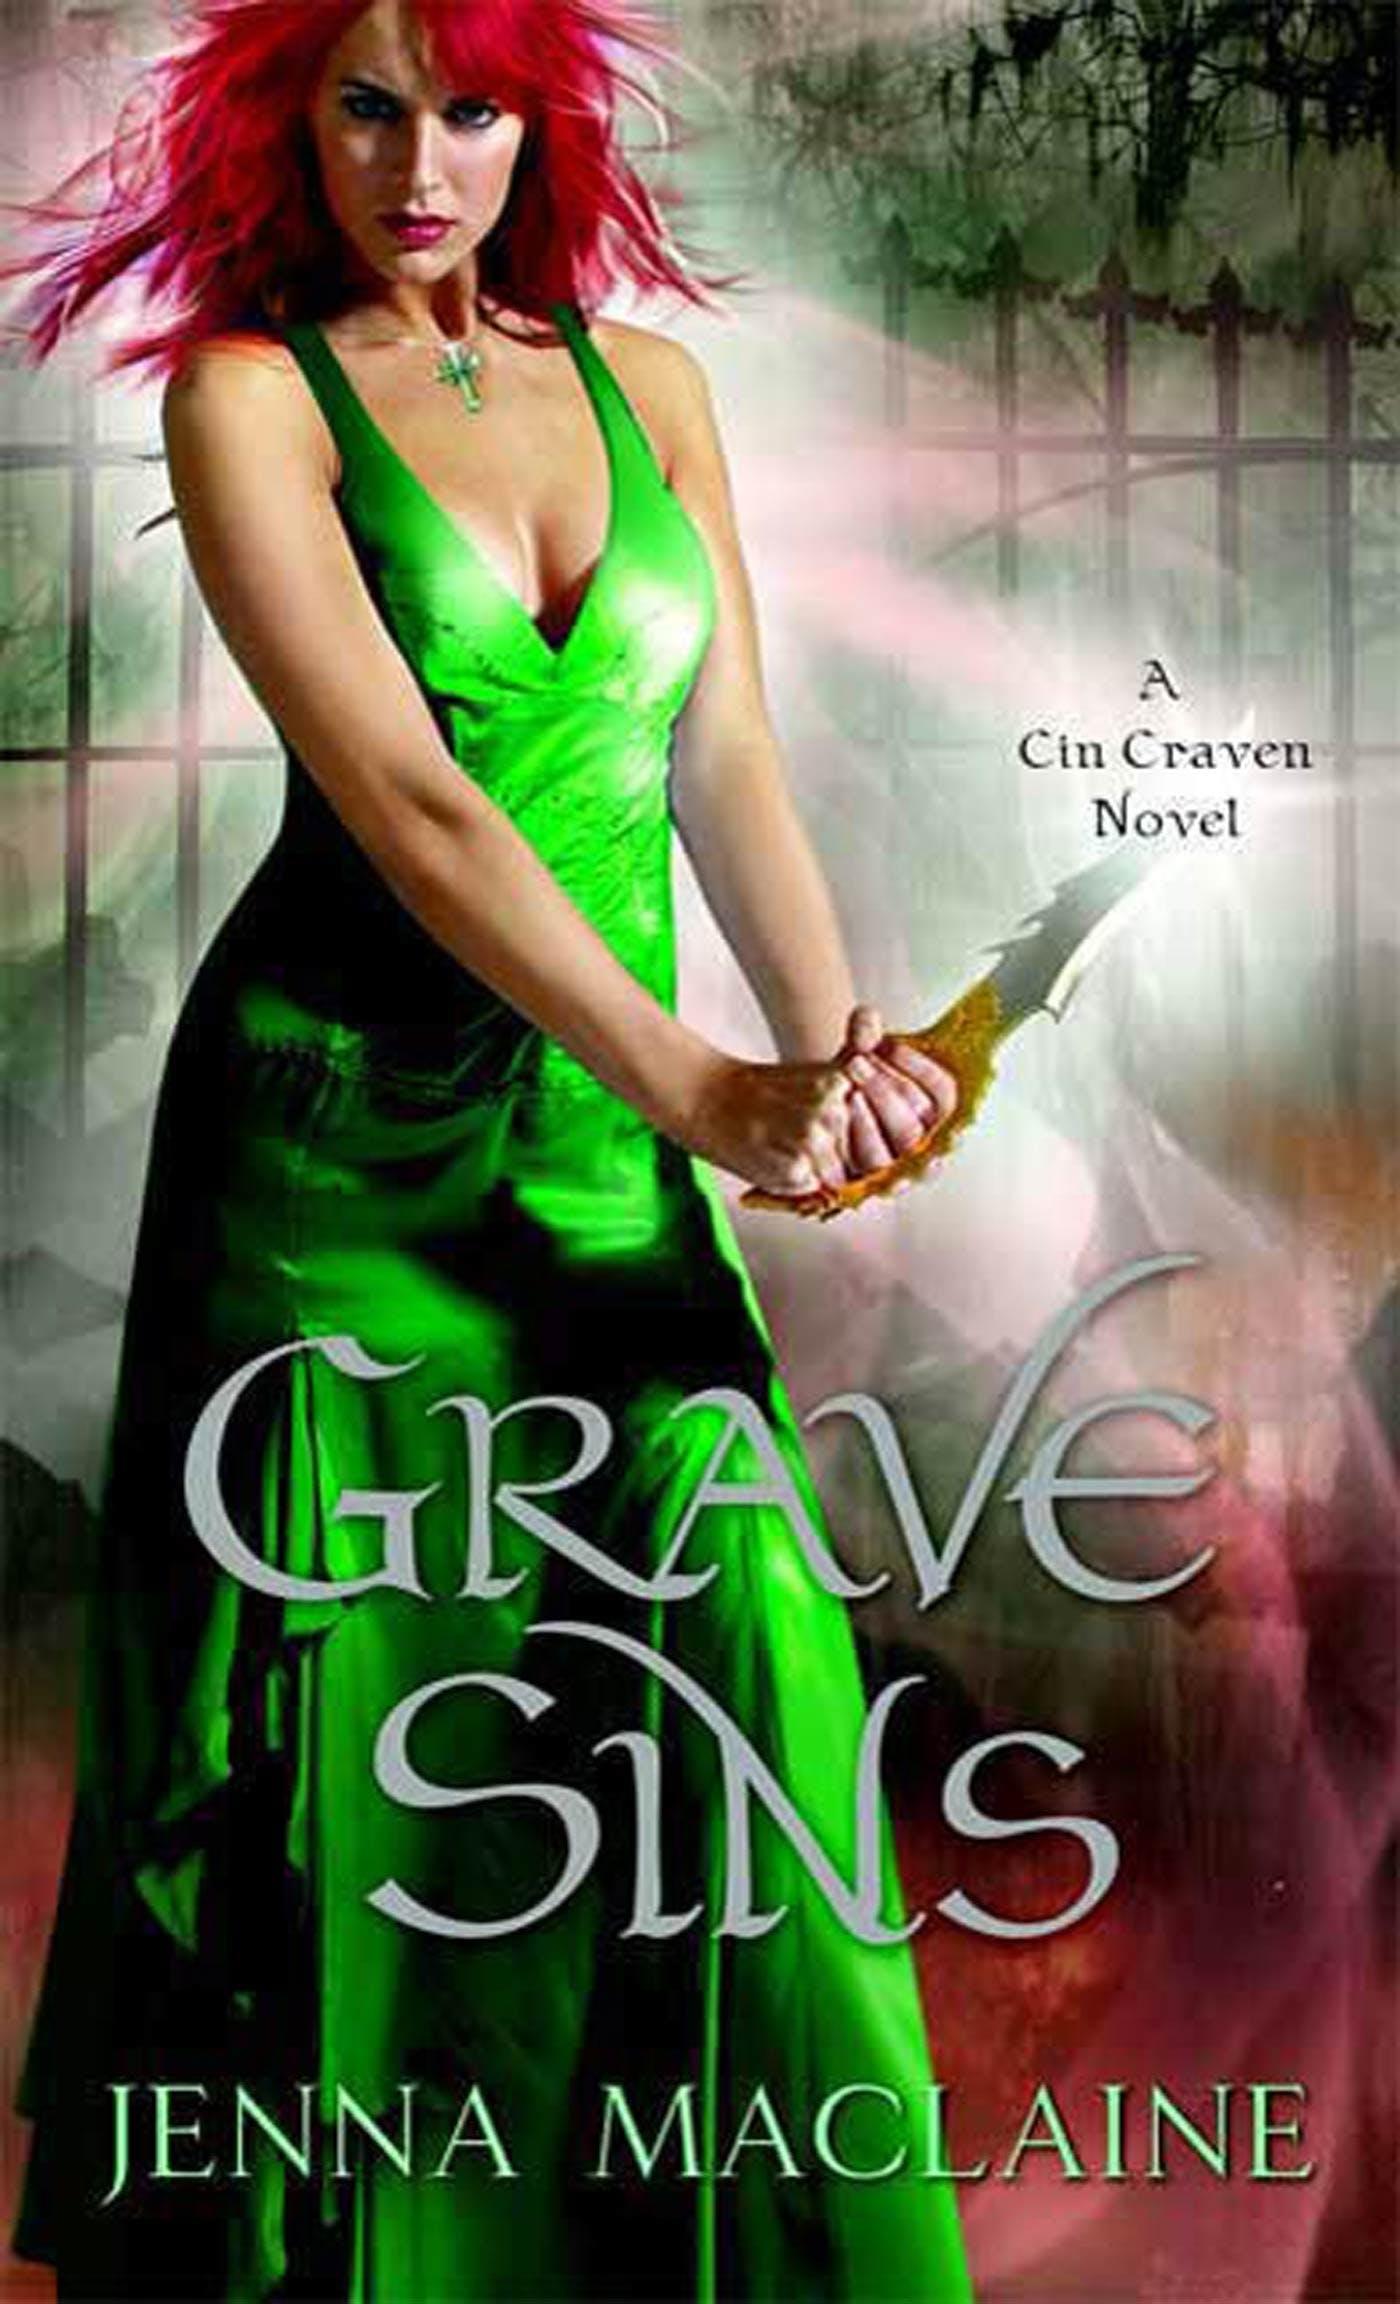 Image of Grave Sins